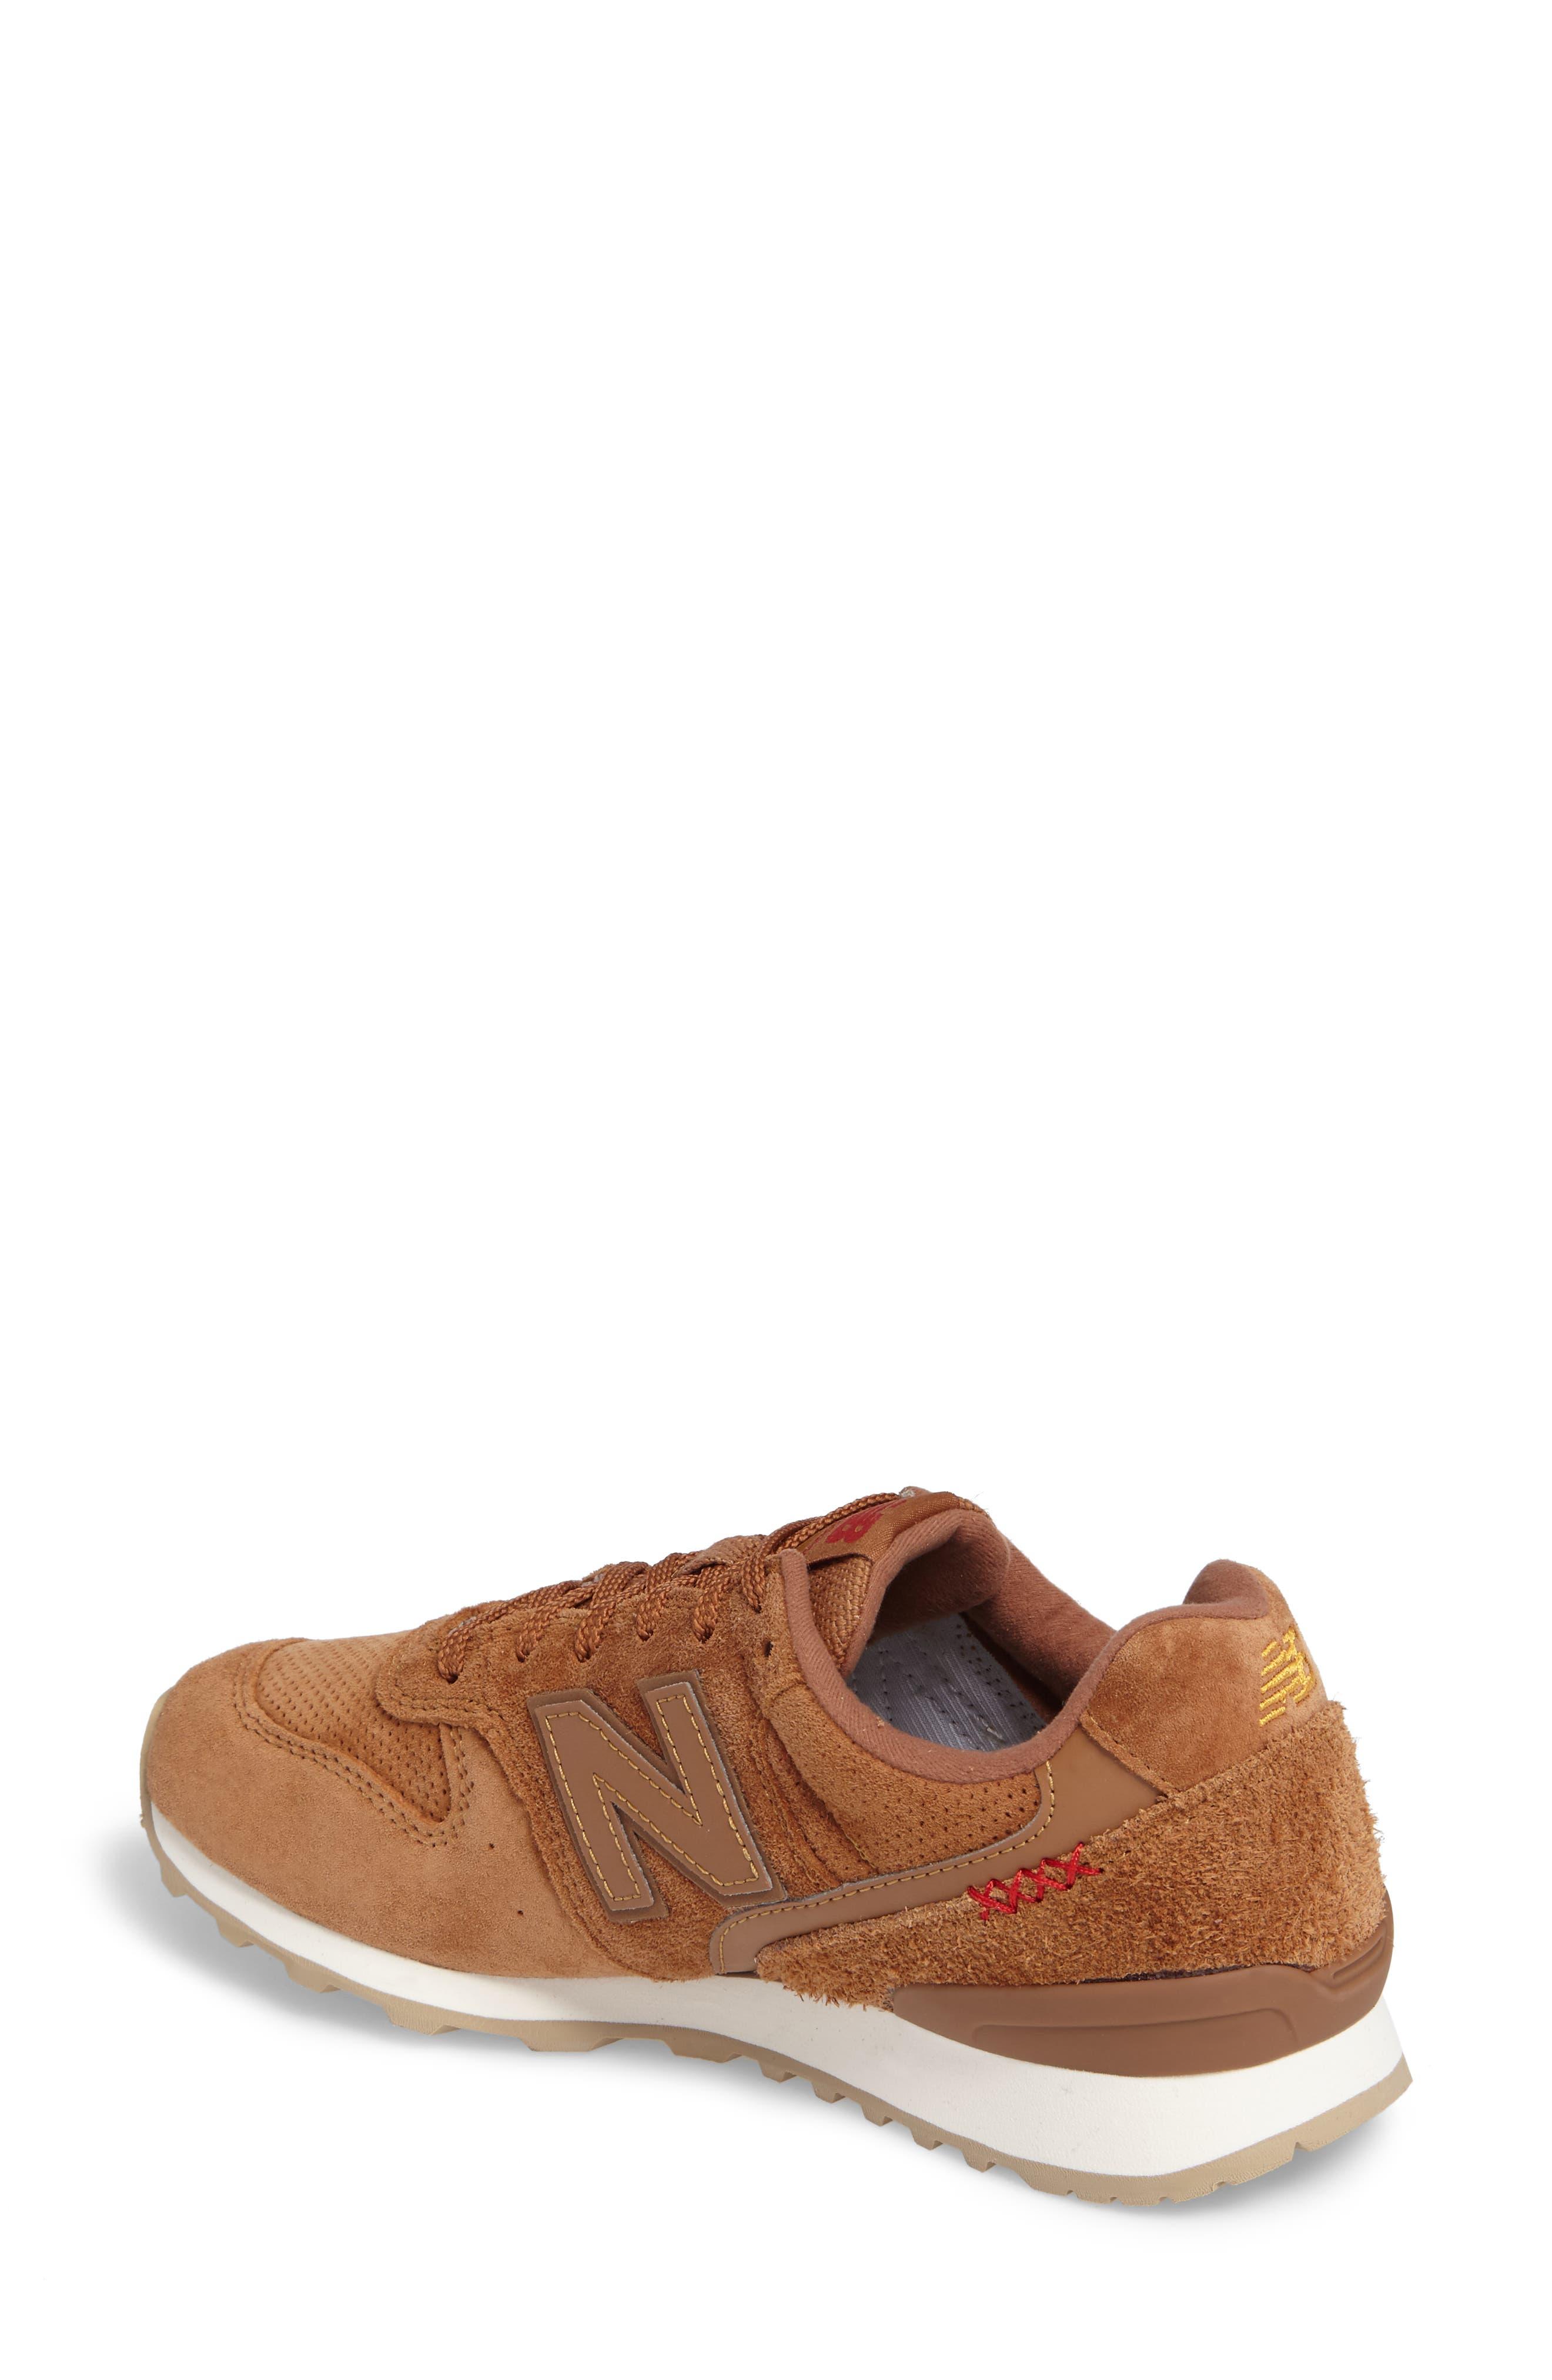 Alternate Image 2  - New Balance 696 Sneaker (Women)